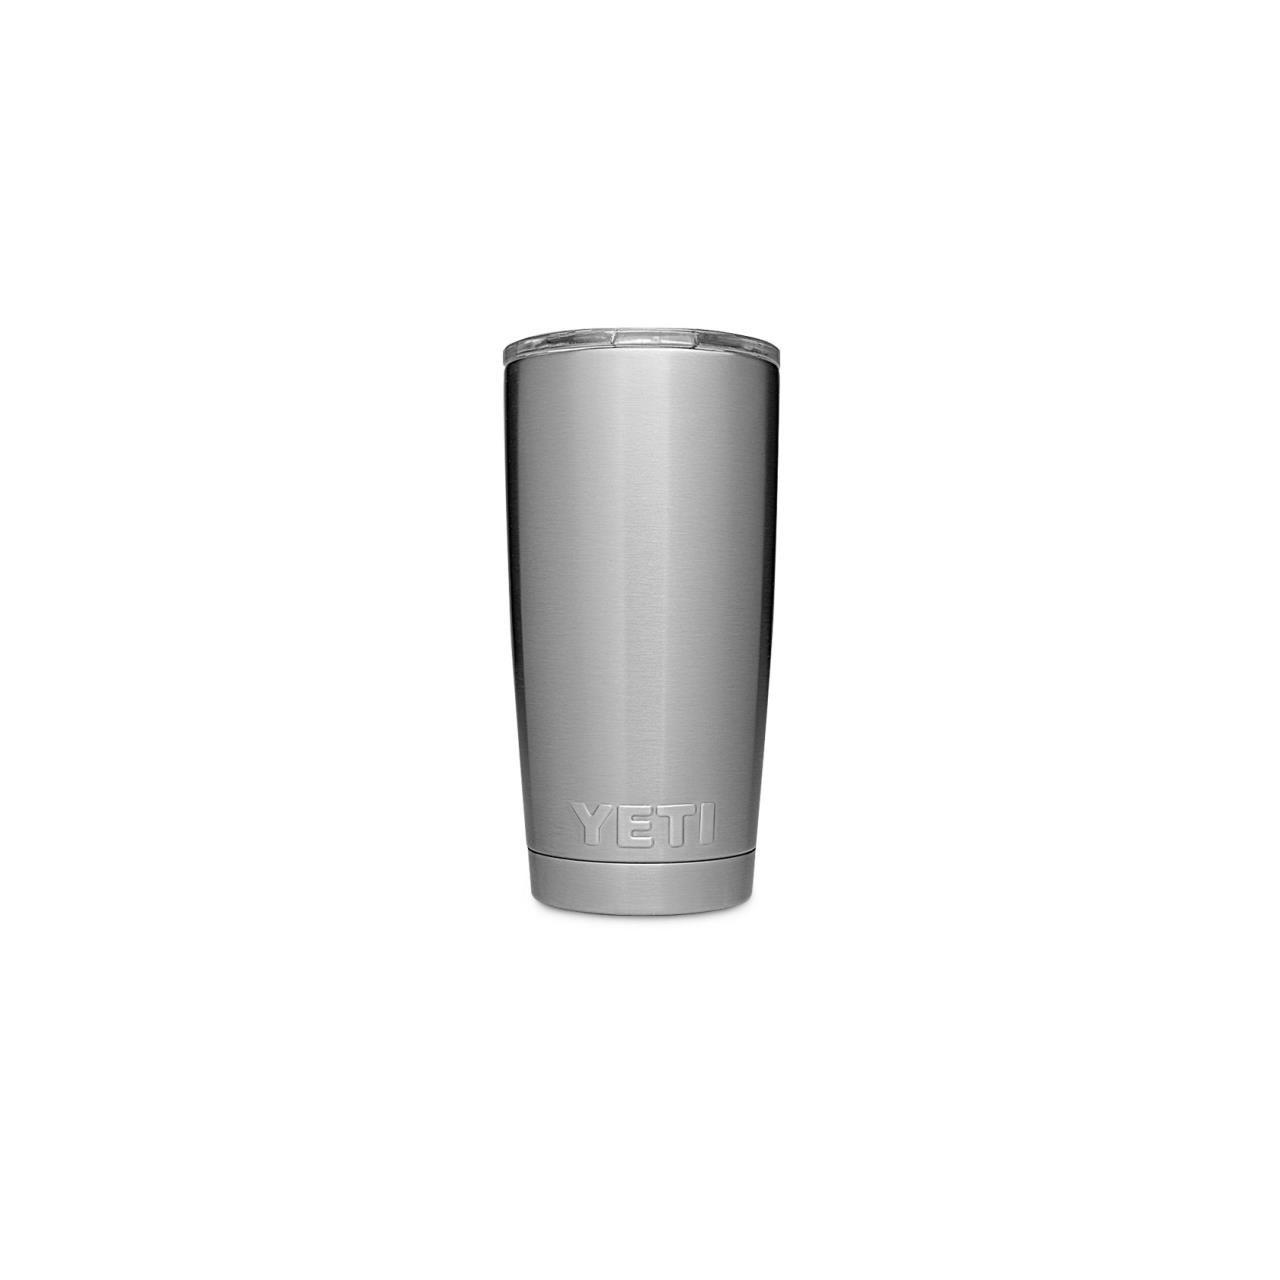 Yeti Rambler 20 Tumbler - Magslide Lid - 888830021828